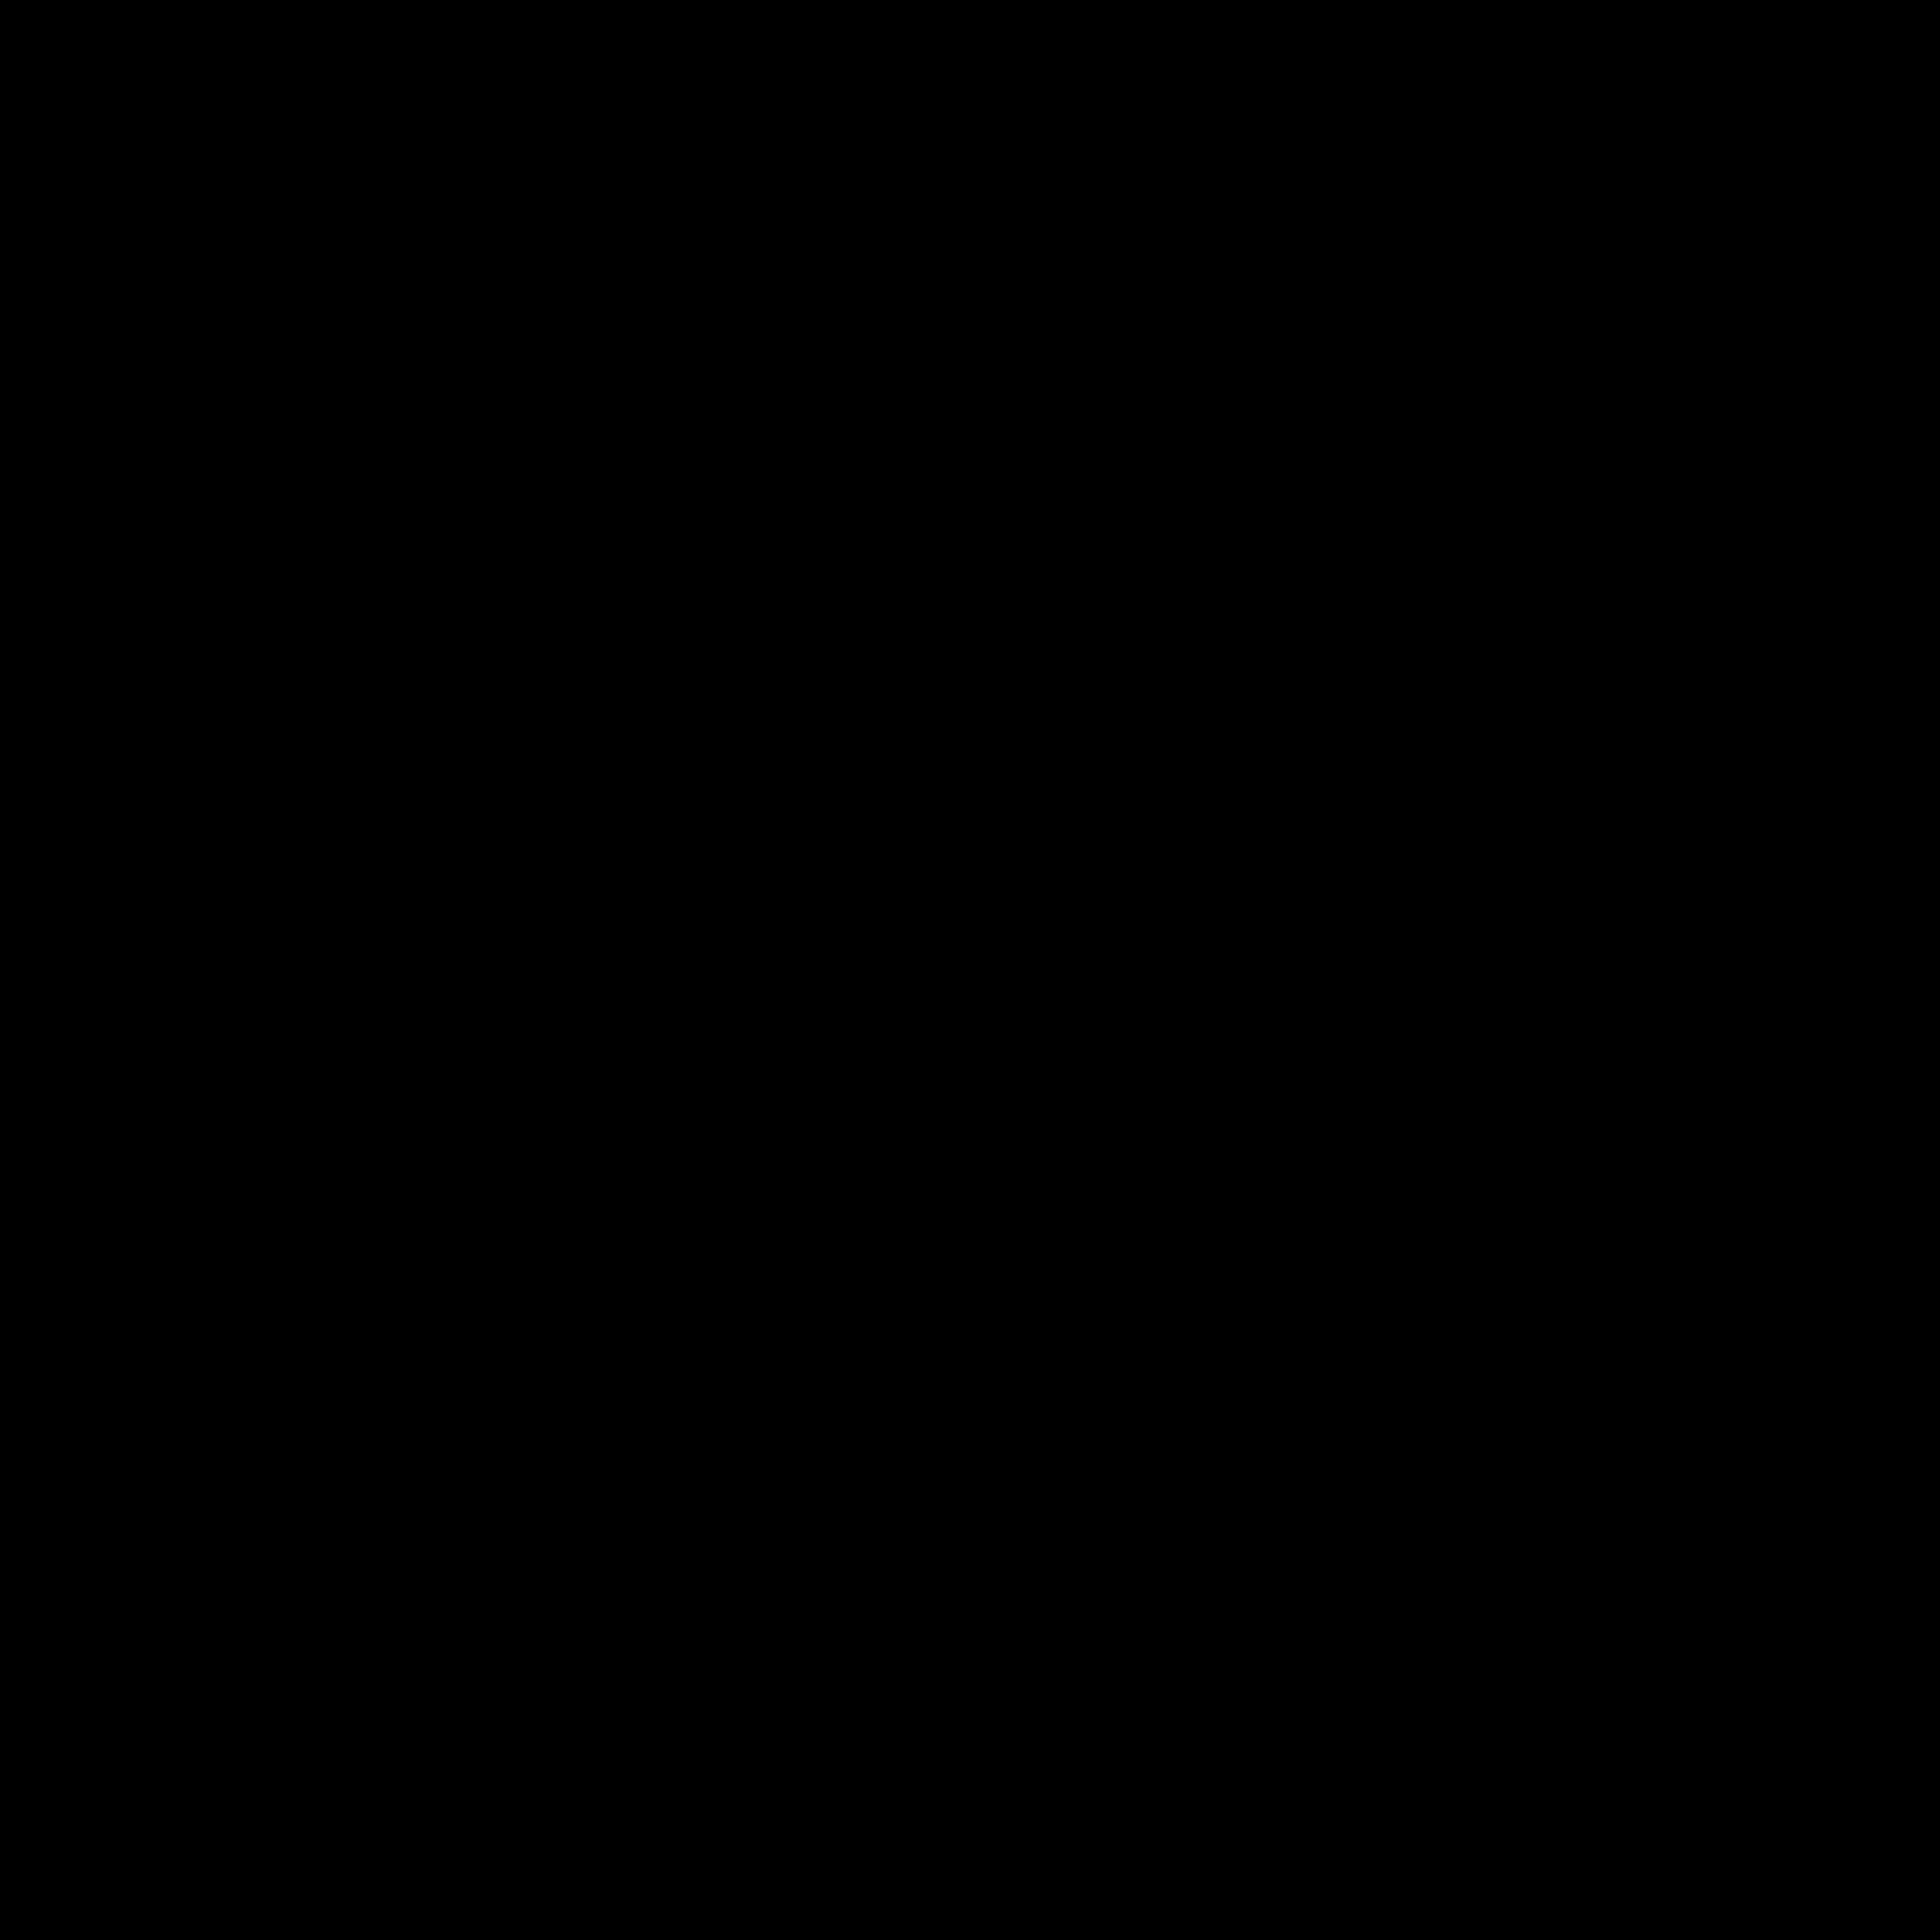 Black Sun PNG - 155167